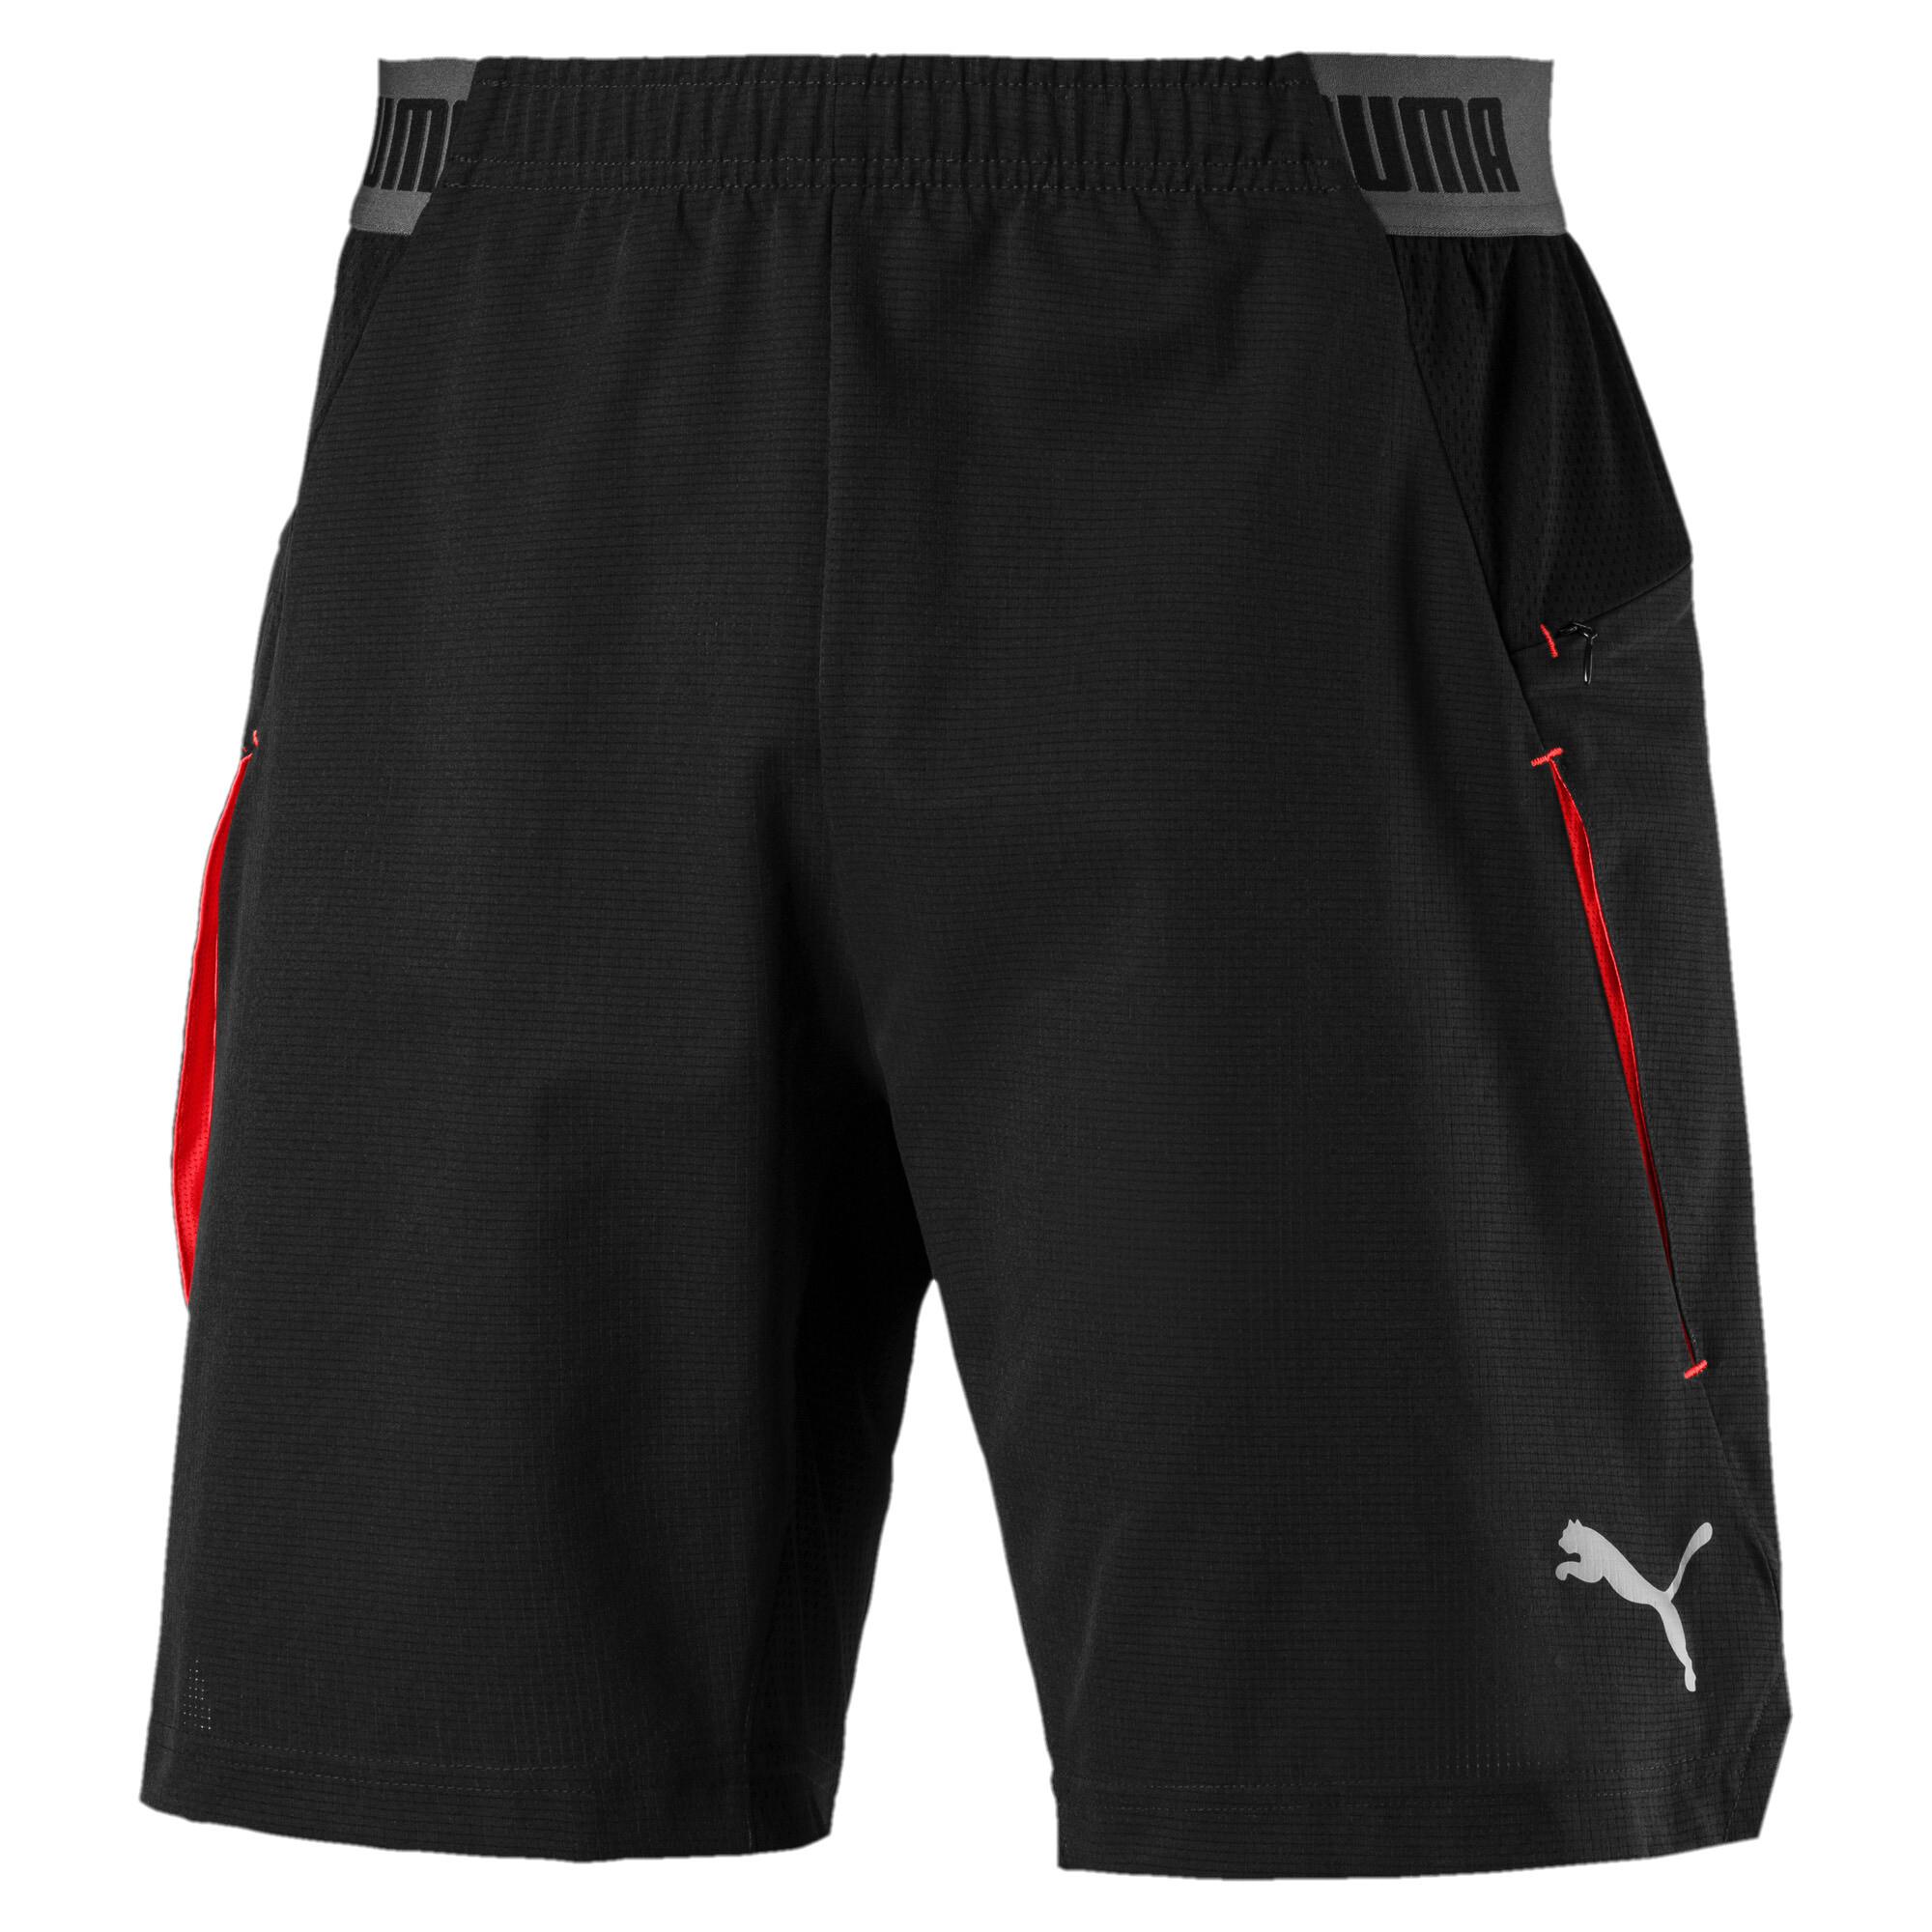 Shorts de fútbol ftblNXT Pro para hombre